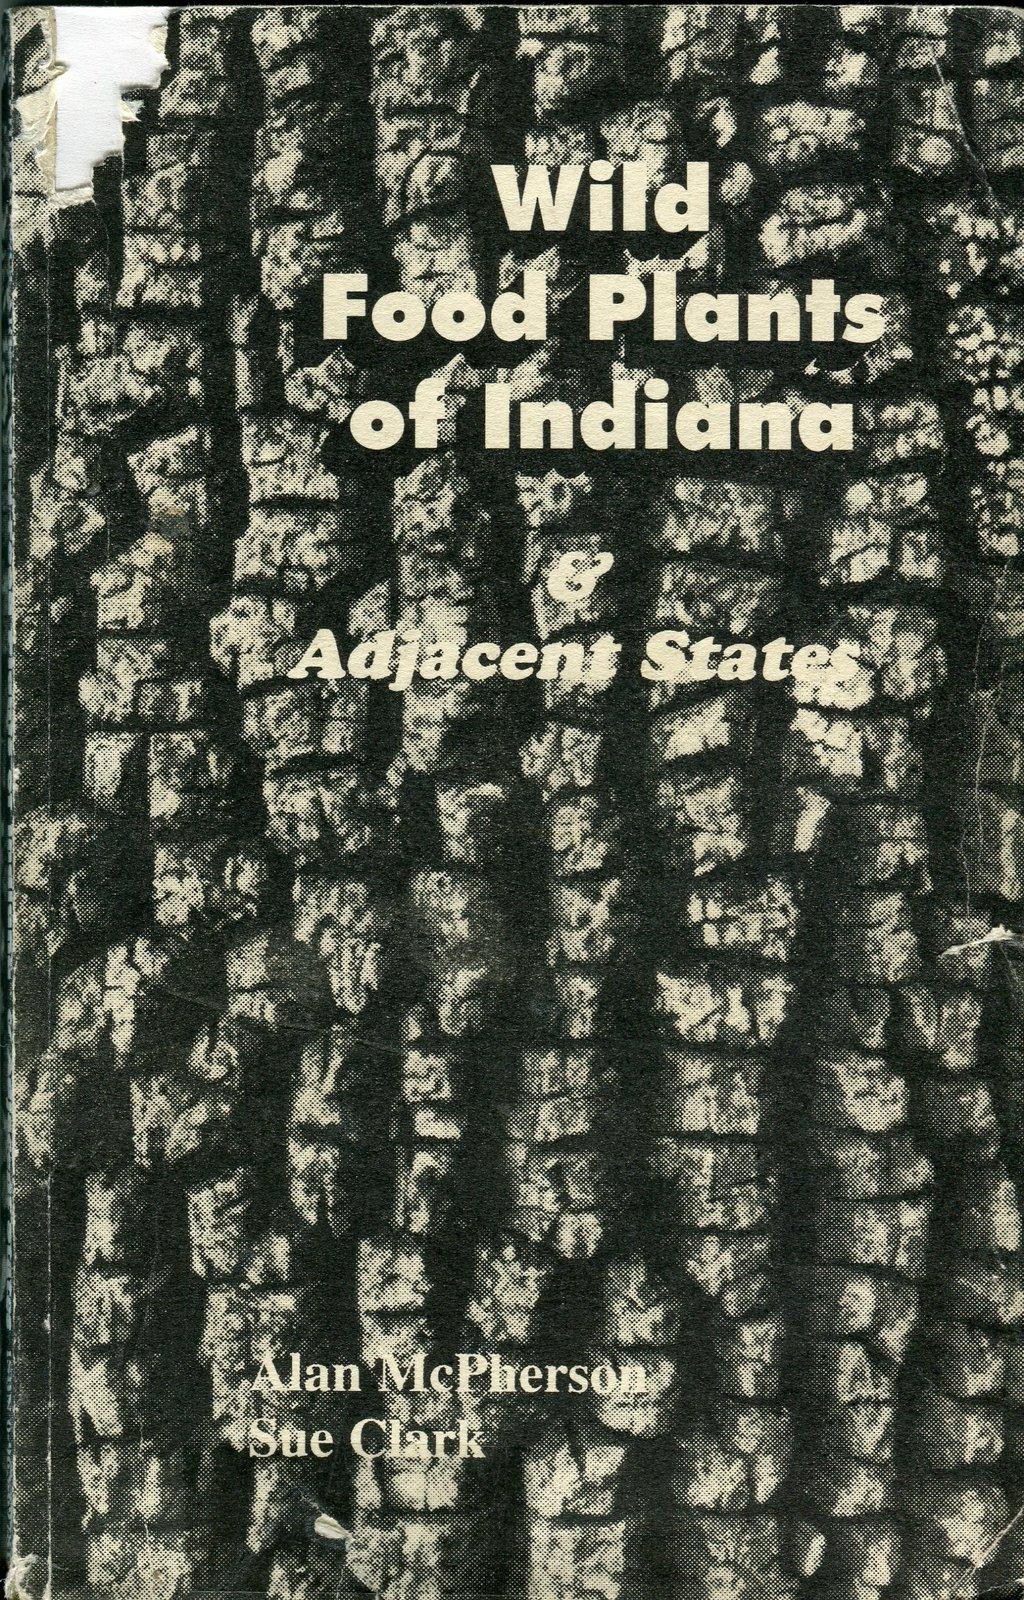 Wild Food Plants of Indiana & Adjacent States ...